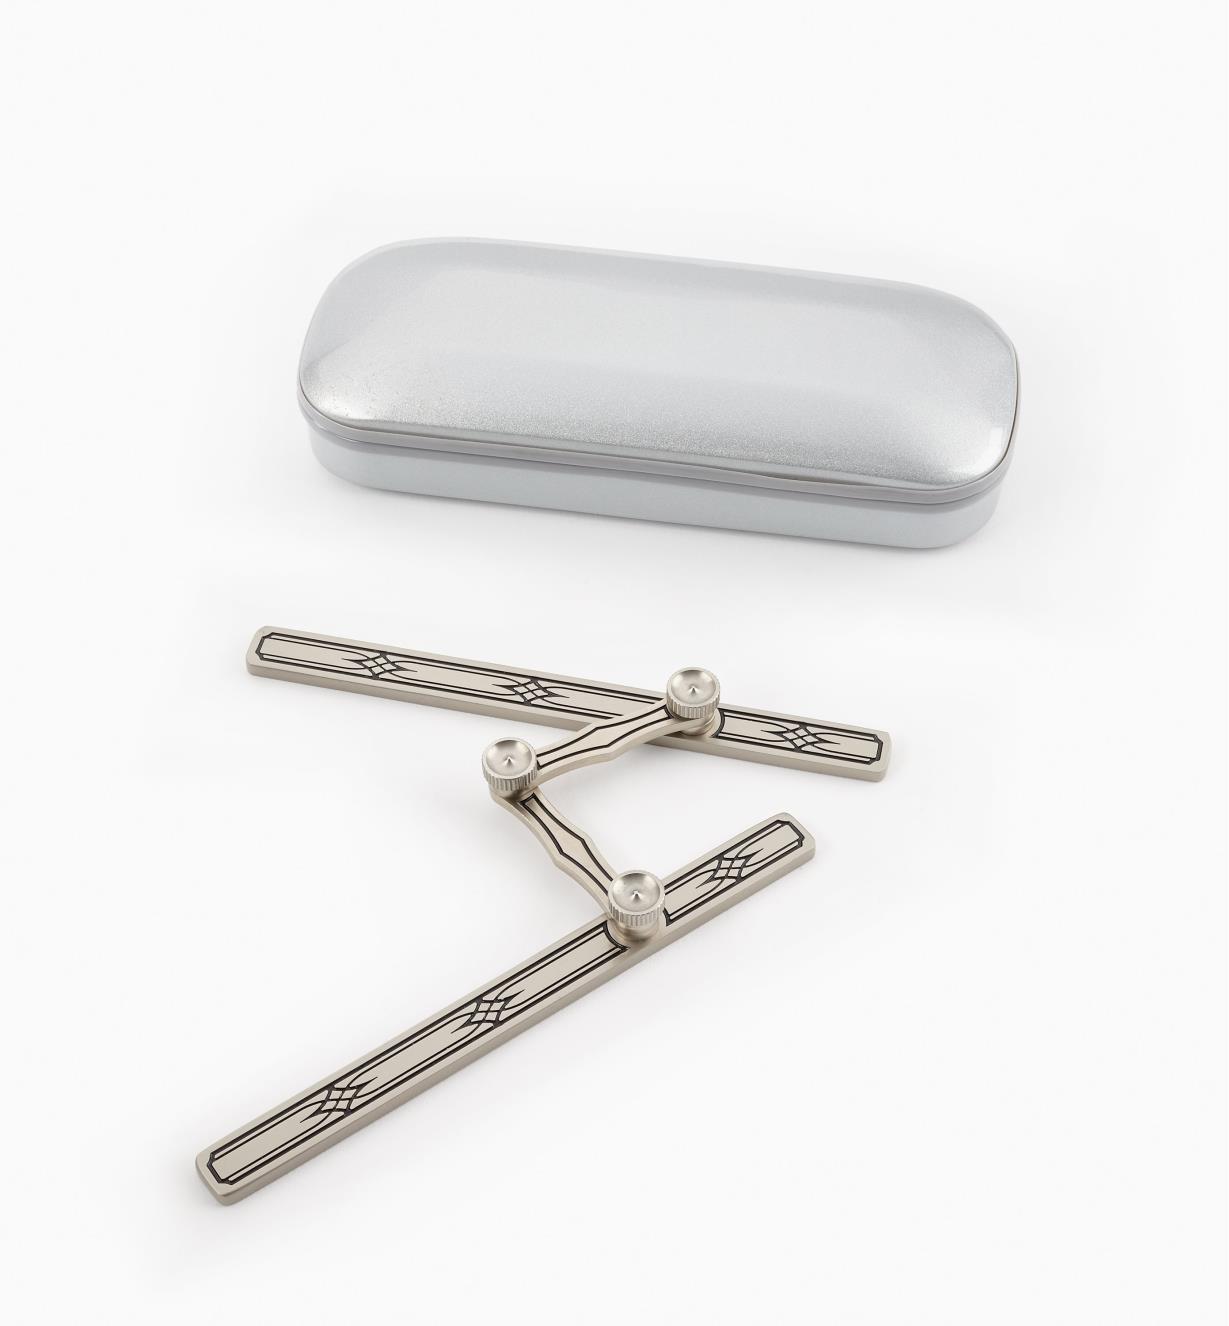 09A0202 - Angle Transfer Tool